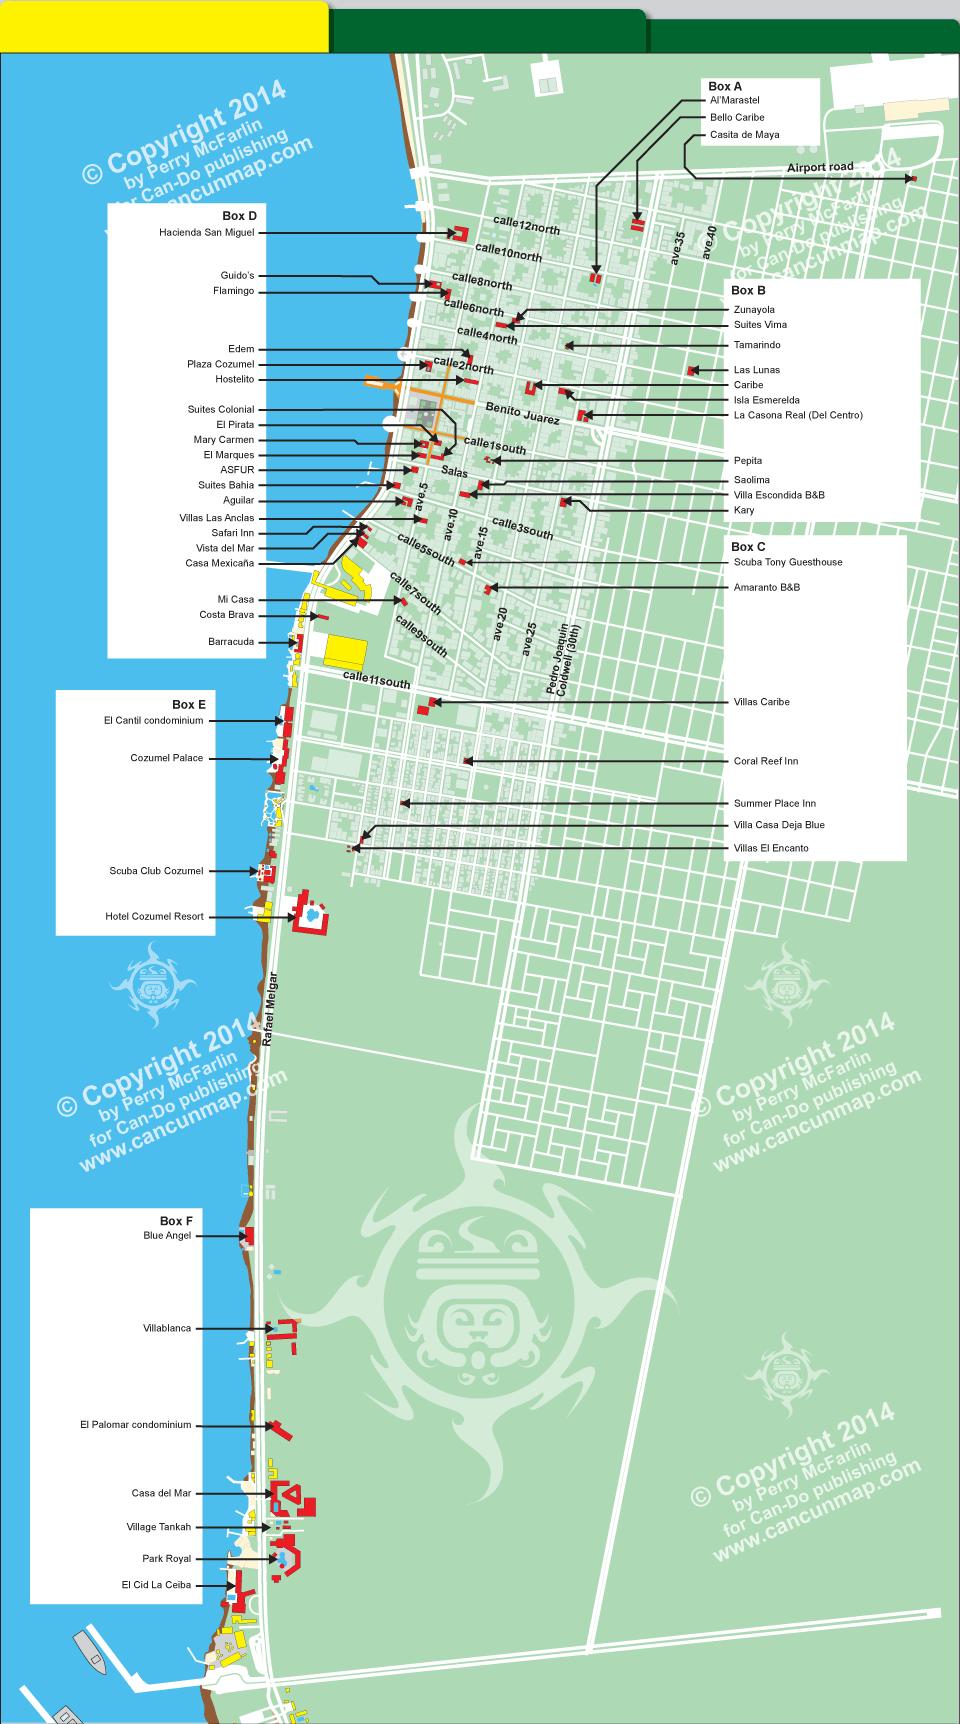 Downtown Cozumel hotel map | Cozumel for us | Cozumel, Cozumel ...